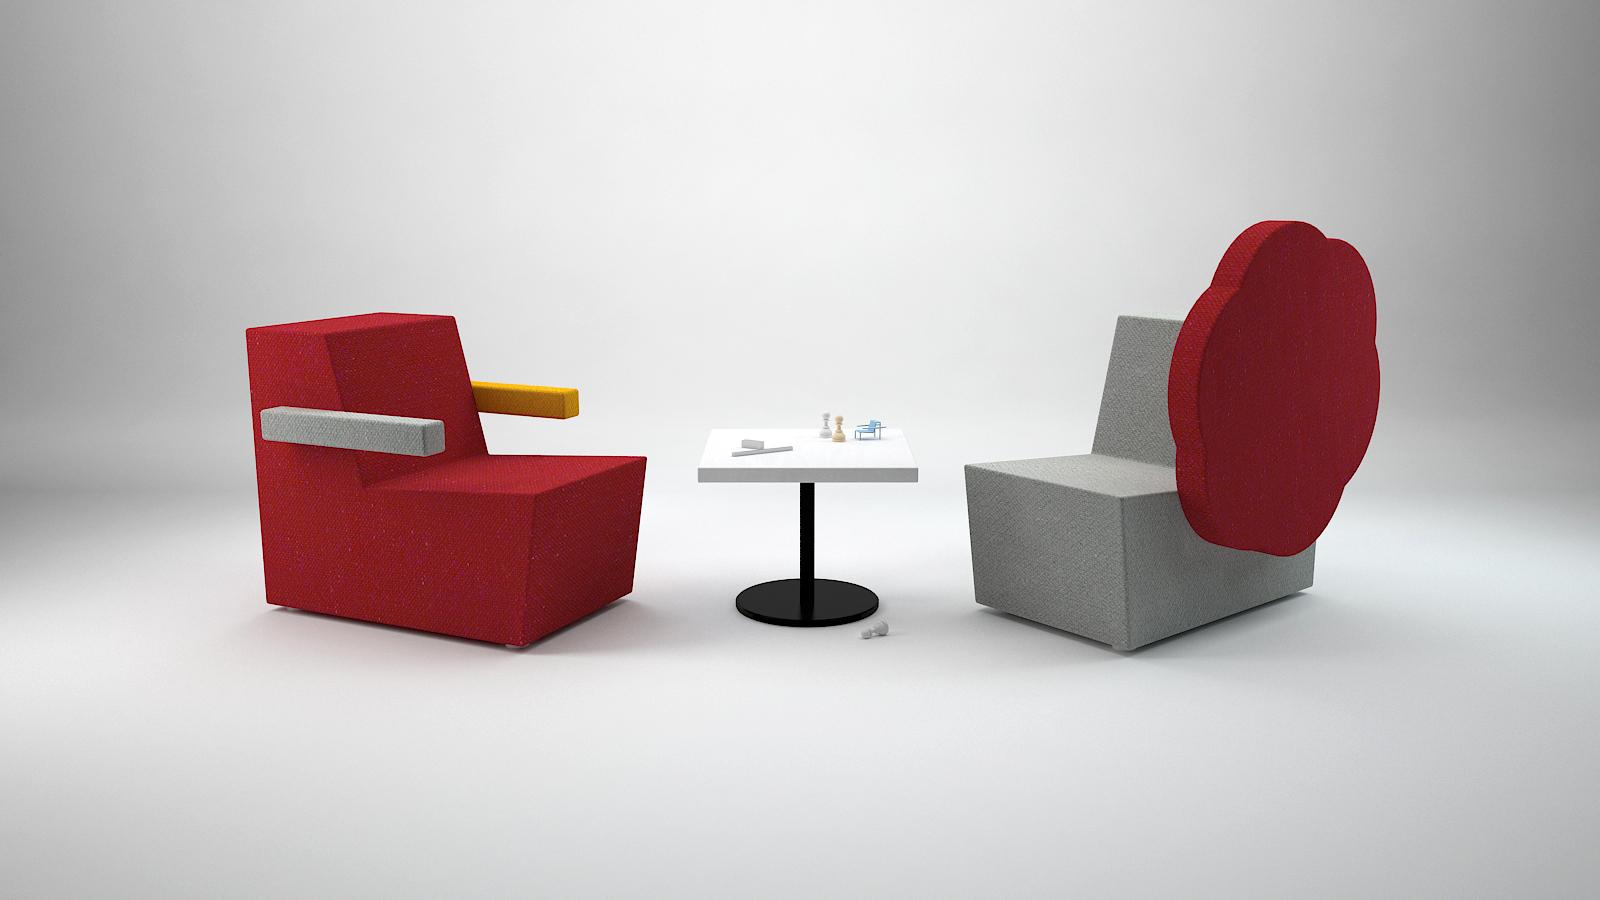 <p>Goodside chair – roel elsinga</p>